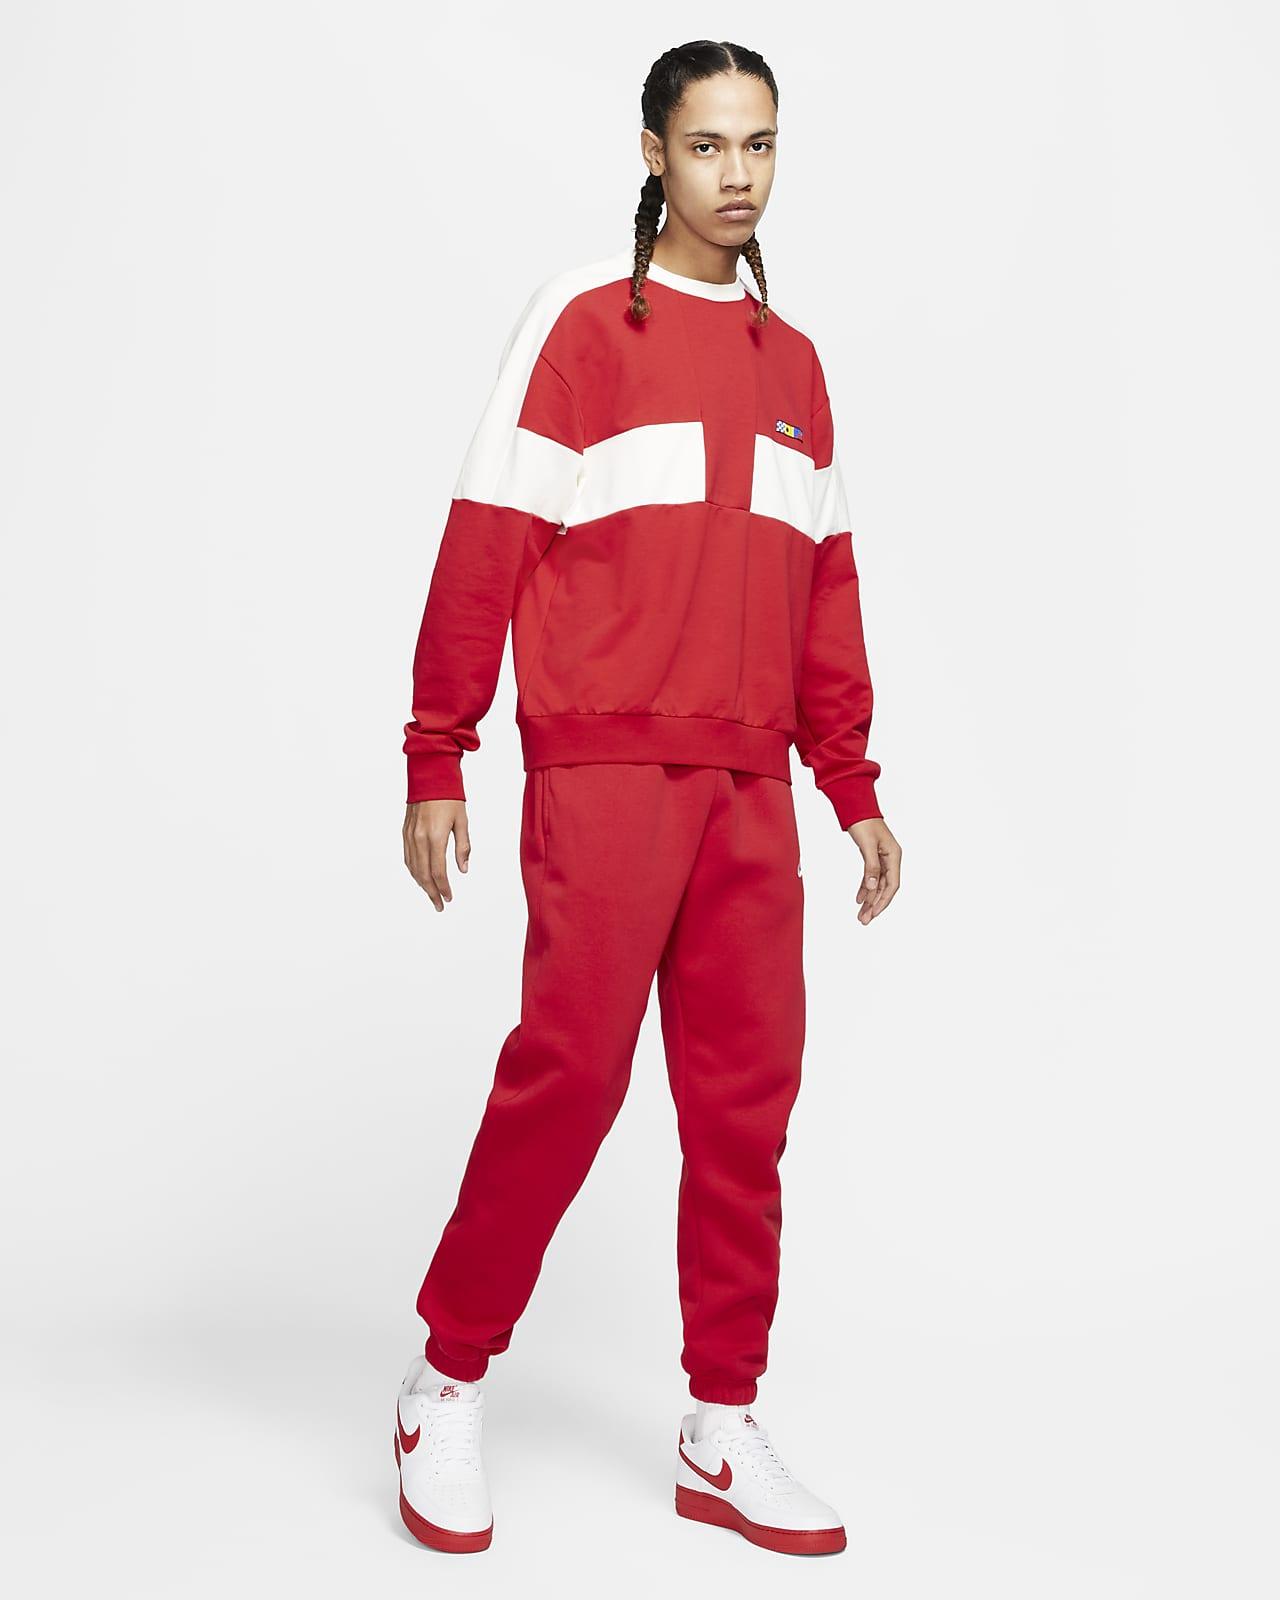 Predownload: Nike Sportswear Reissue Men S French Terry Crew Nike Com [ 1600 x 1280 Pixel ]